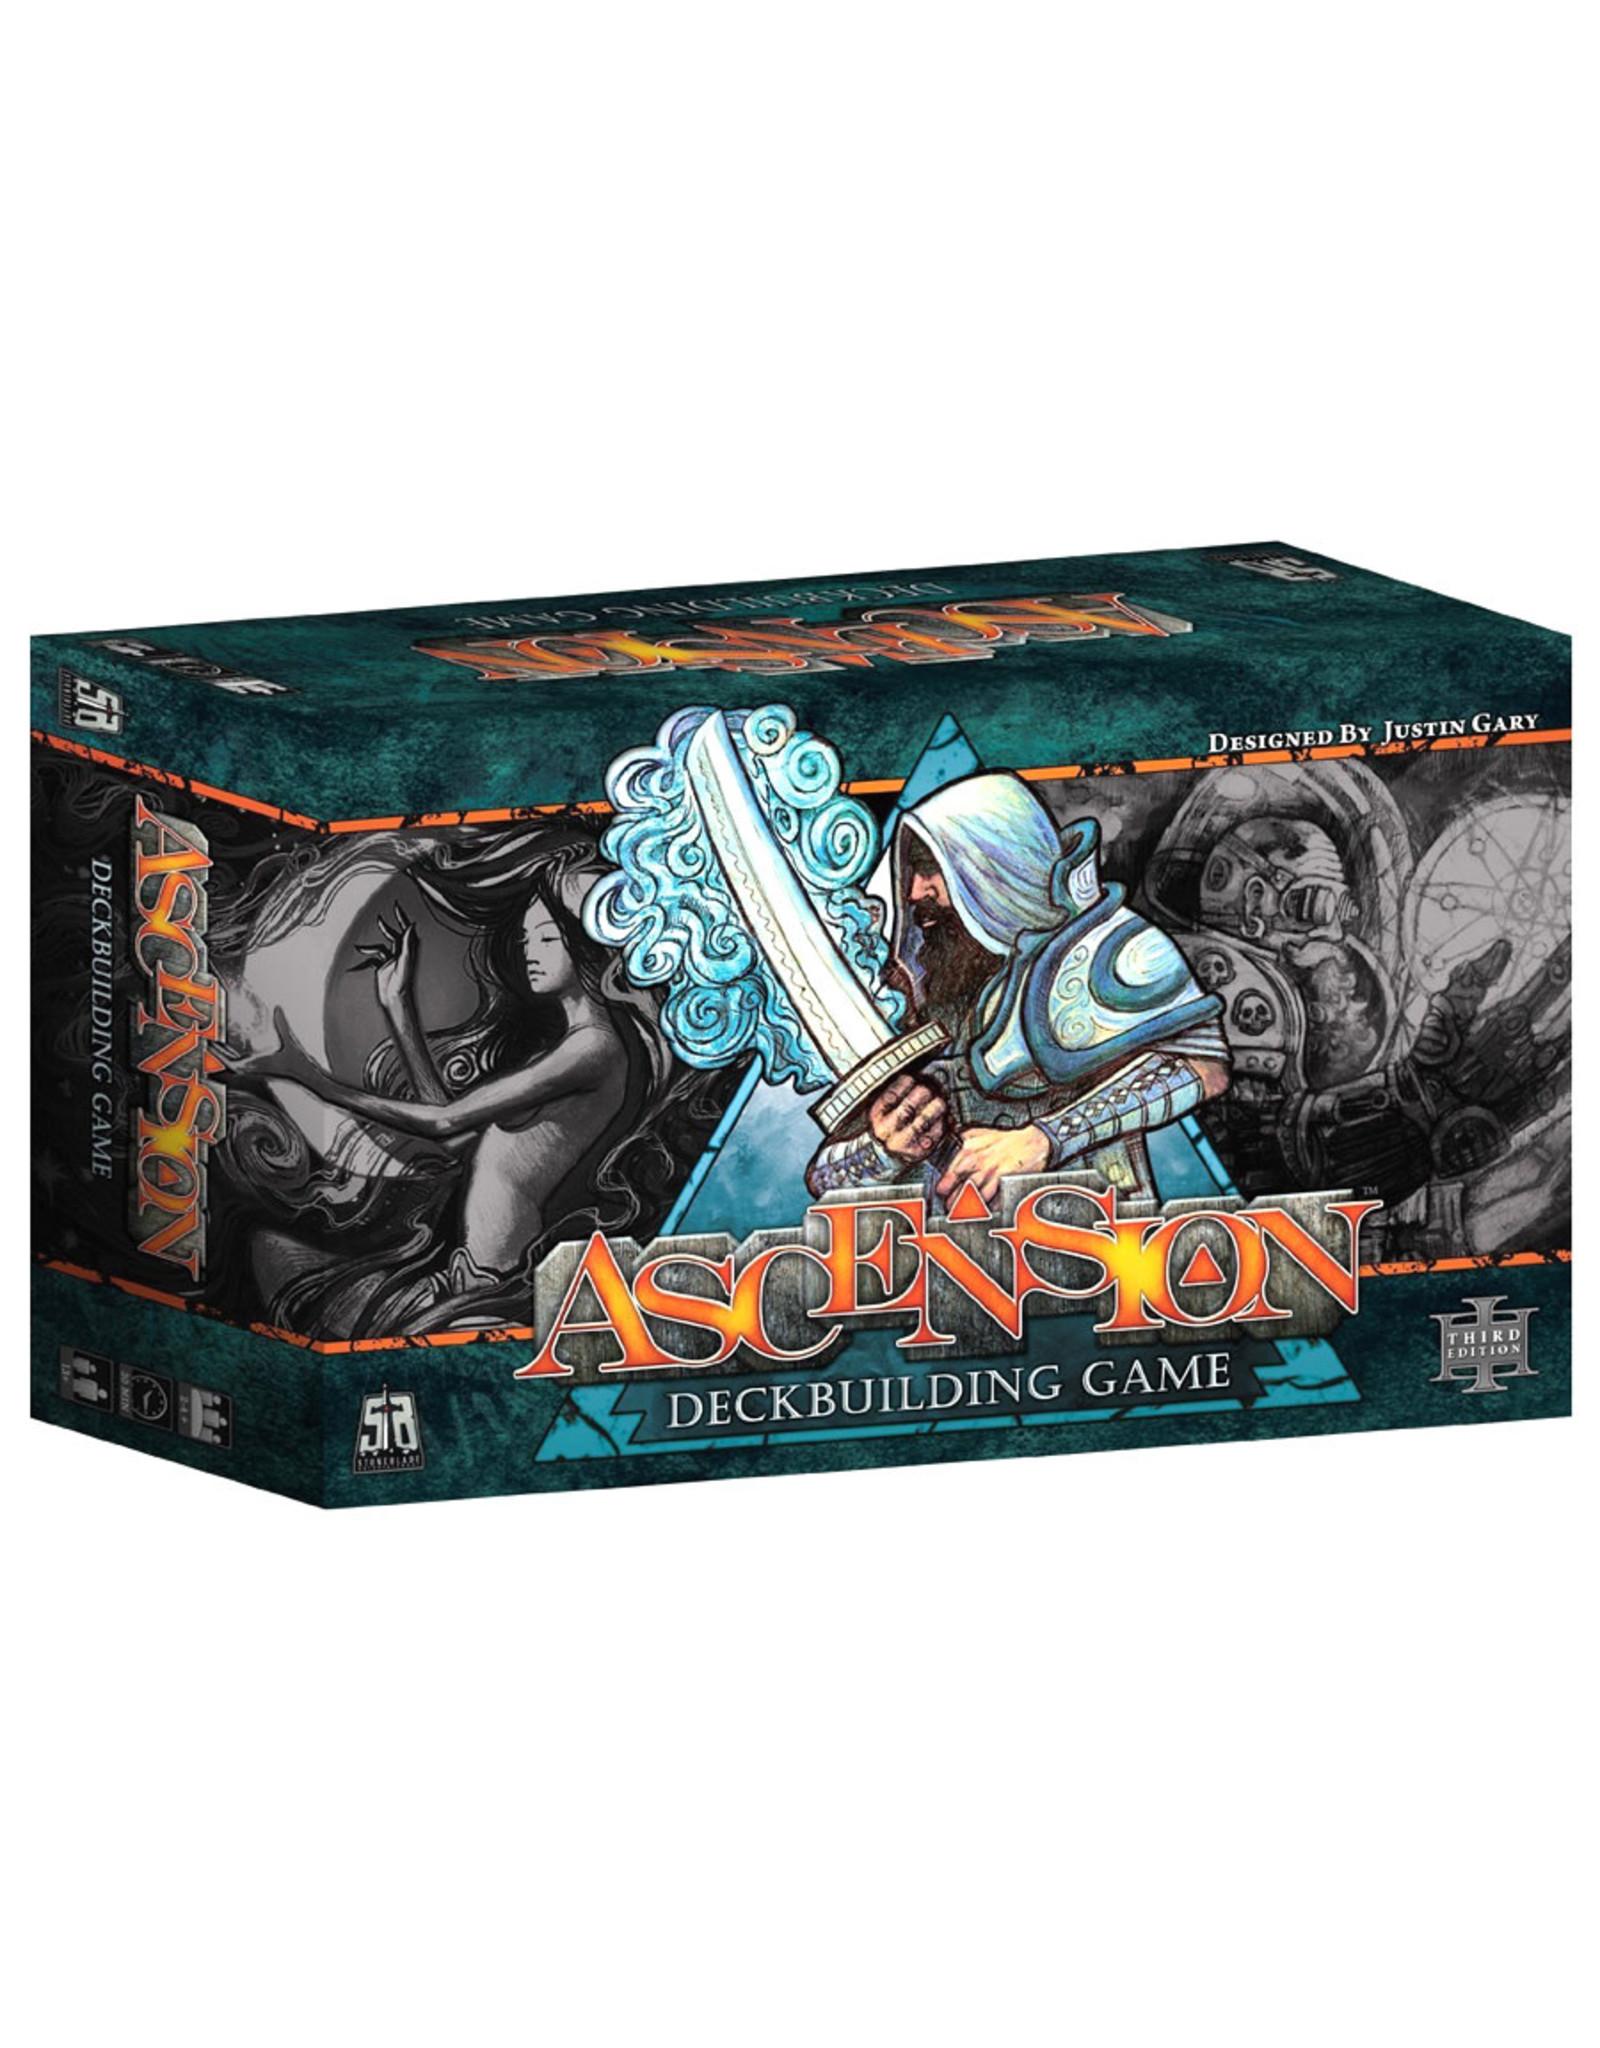 Ultra Pro Ascension: 3rd Edition Core Set